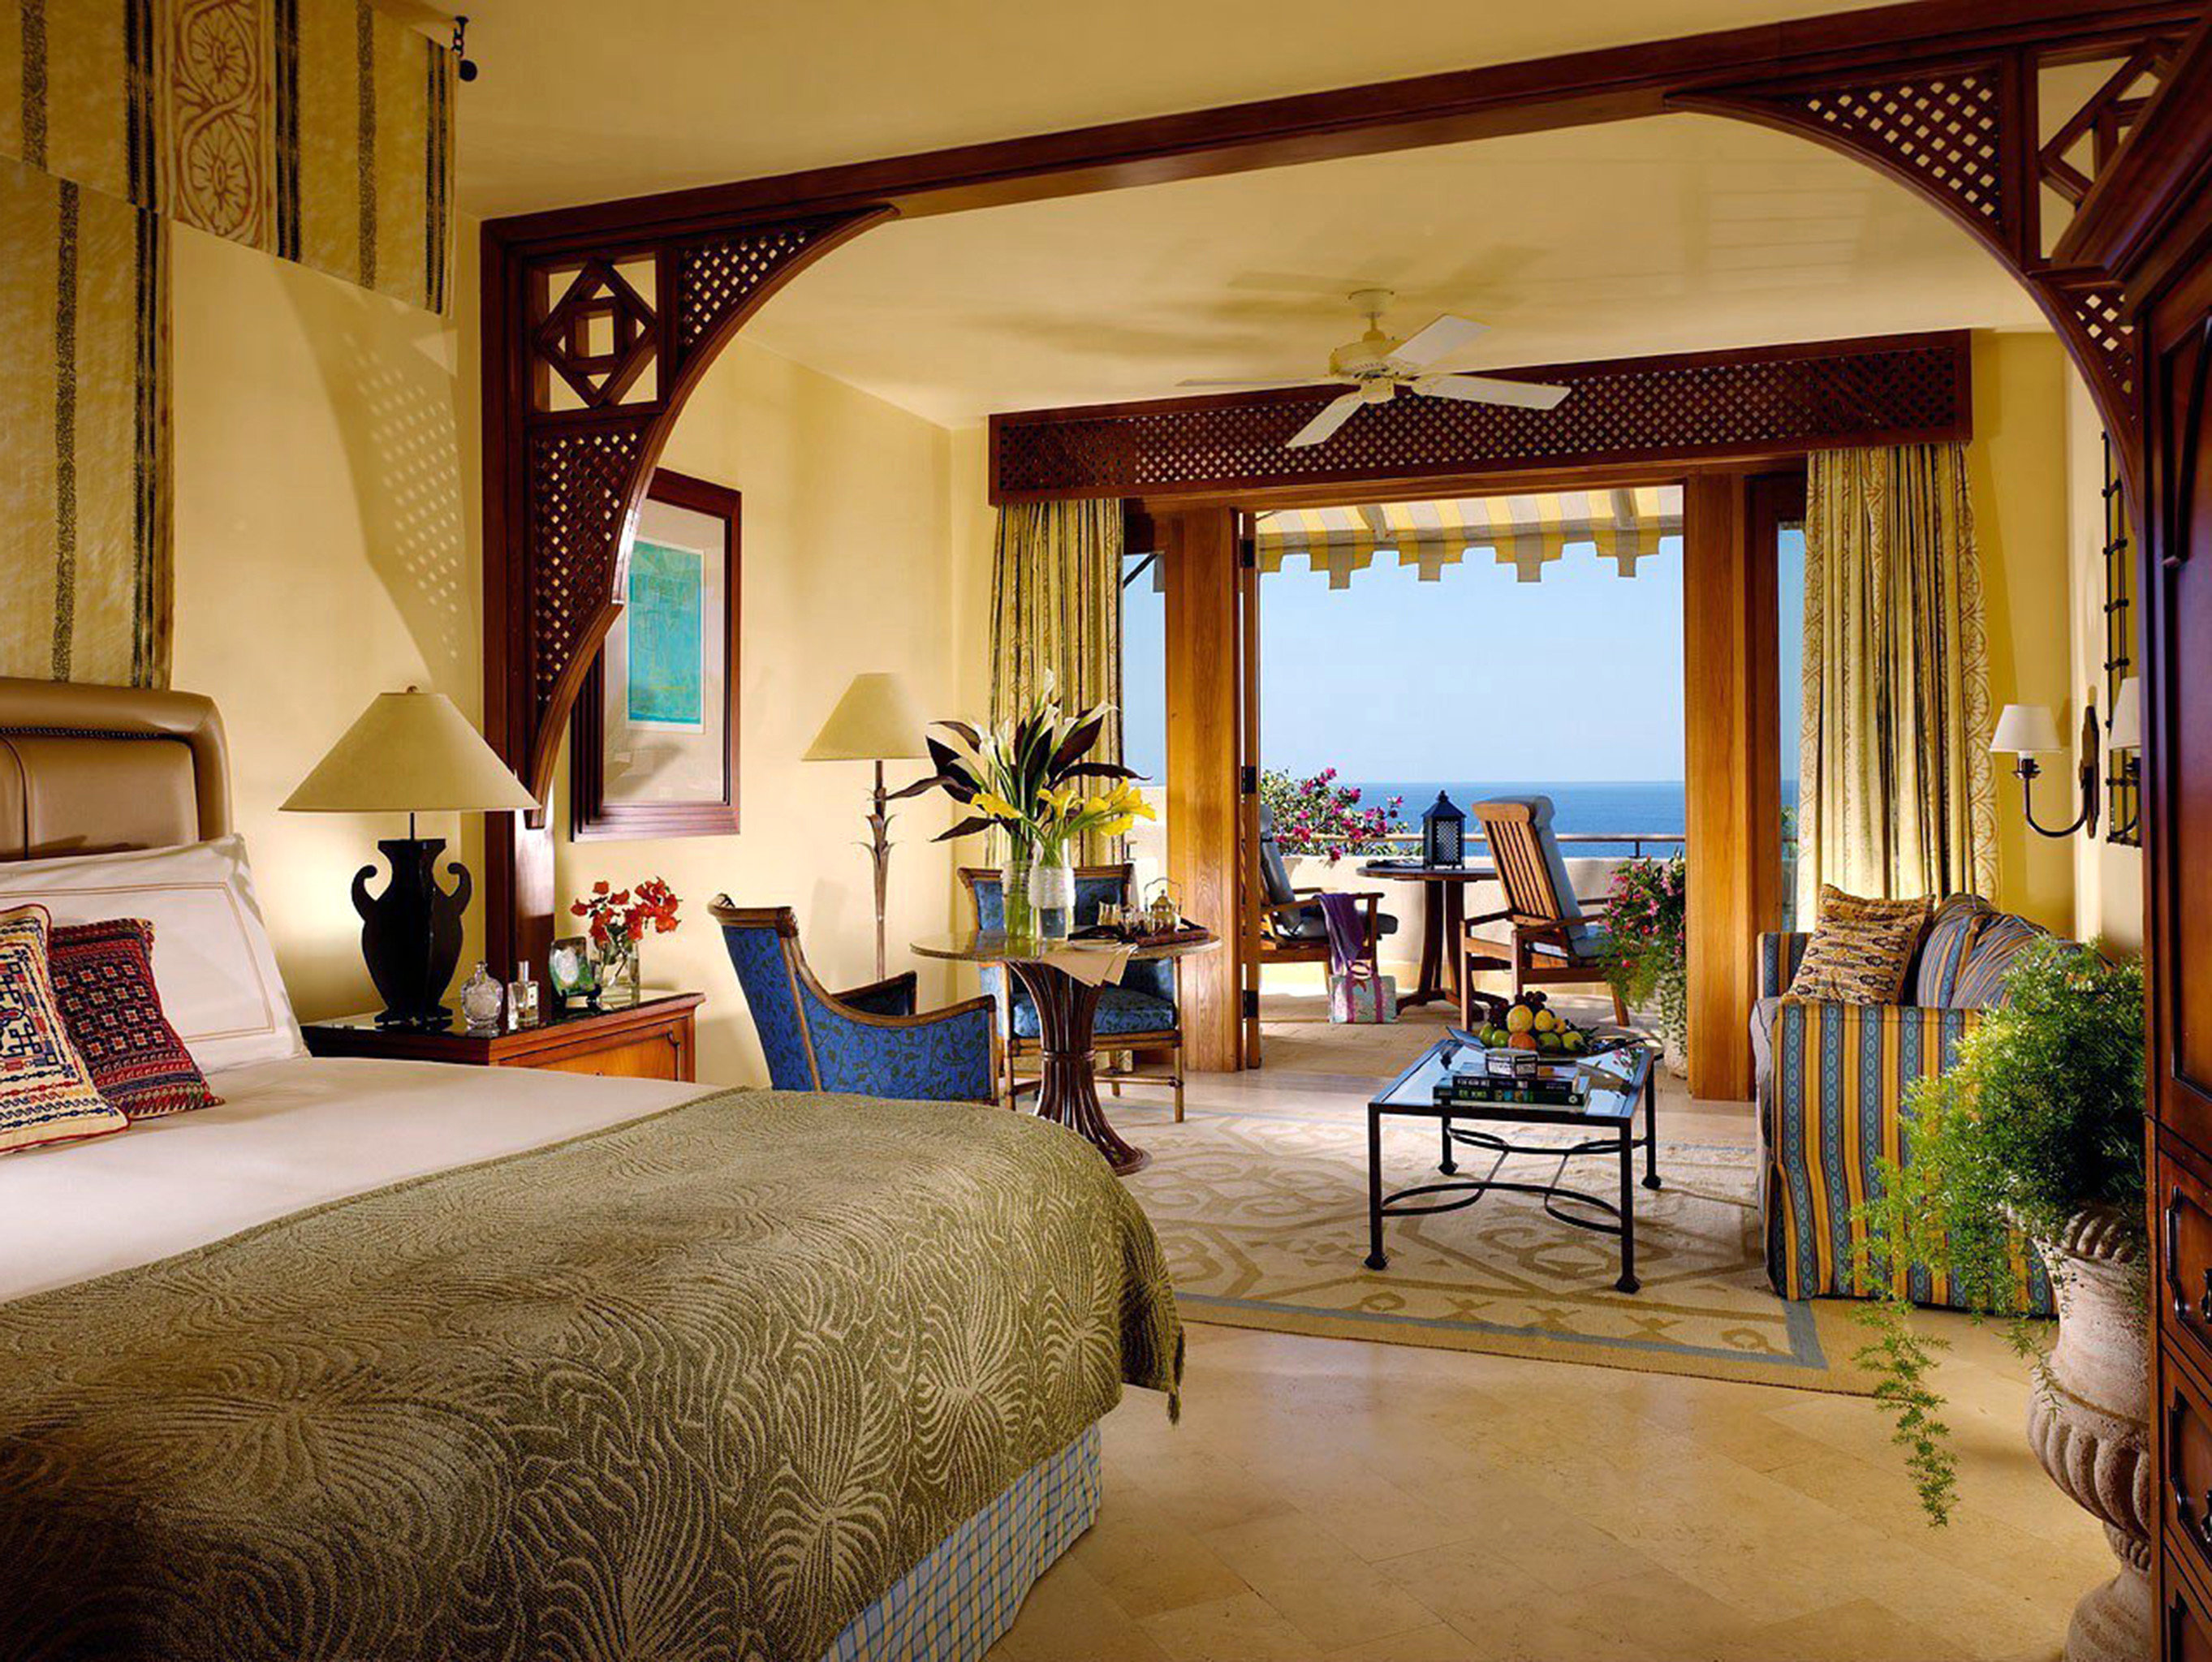 Bedroom Classic Elegant Scenic views Suite property house Villa home Resort living room mansion cottage farmhouse hacienda